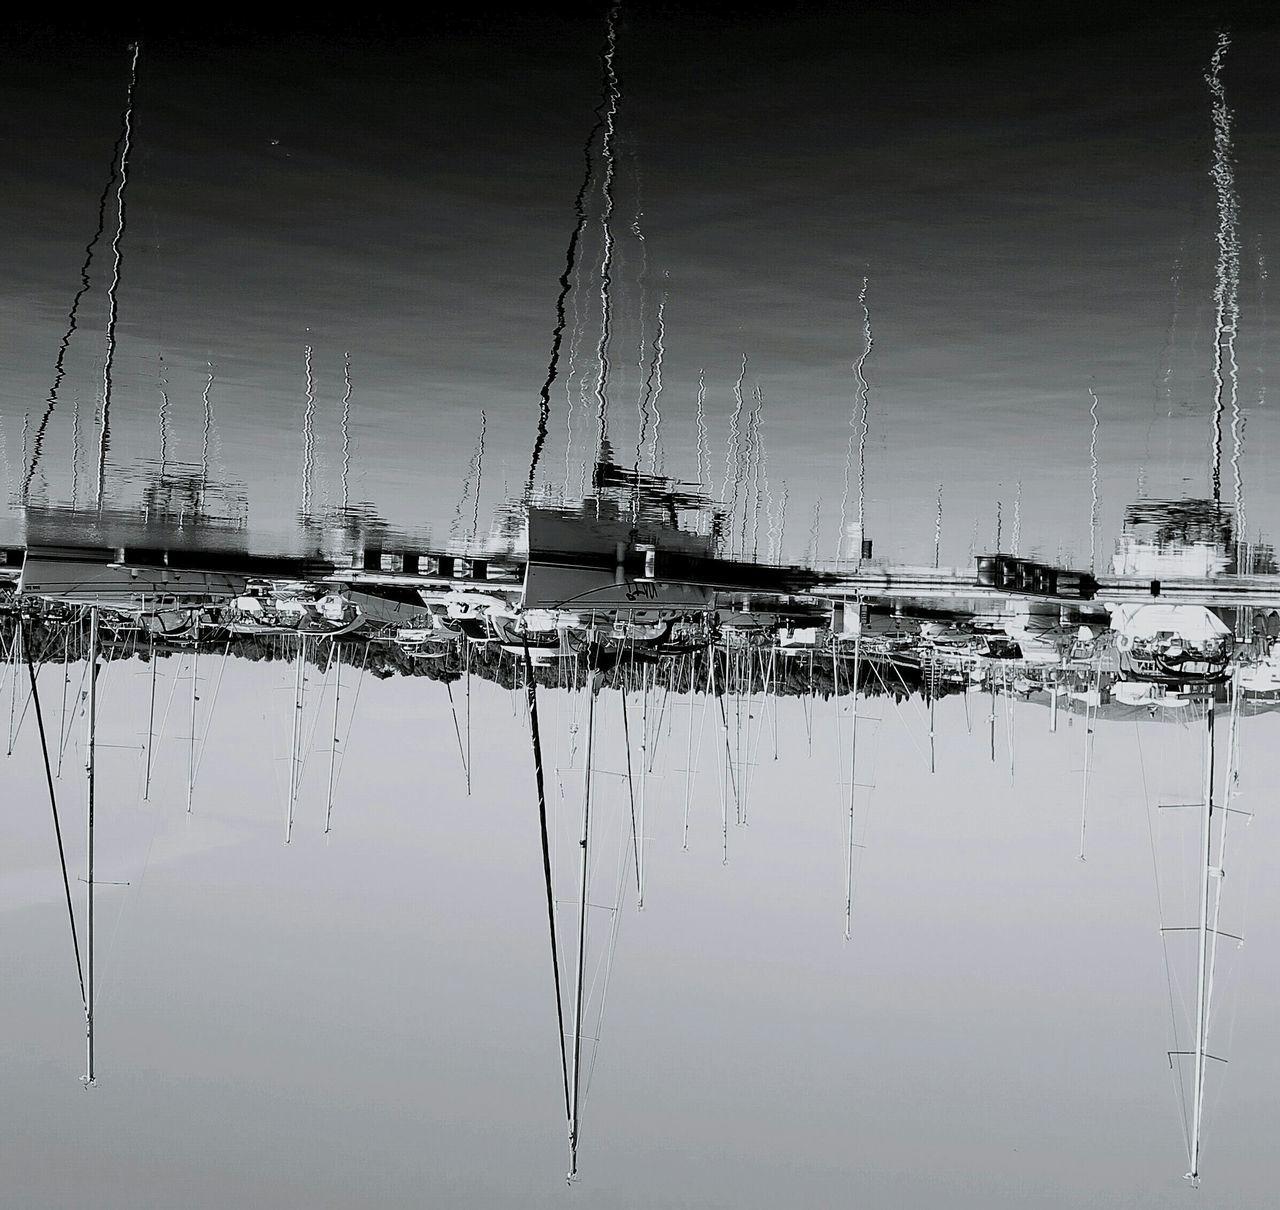 https://youtu.be/JJdv2DGu-qc Saturday_flip One Pic/2 Editspt1 Blackandwhite Photography Minimalism Watching Boats Minimalobsession EyeEm Best Edits EyeEm Best Shots - Black + White EyeEm Gallery Taking Photos 😁🙋